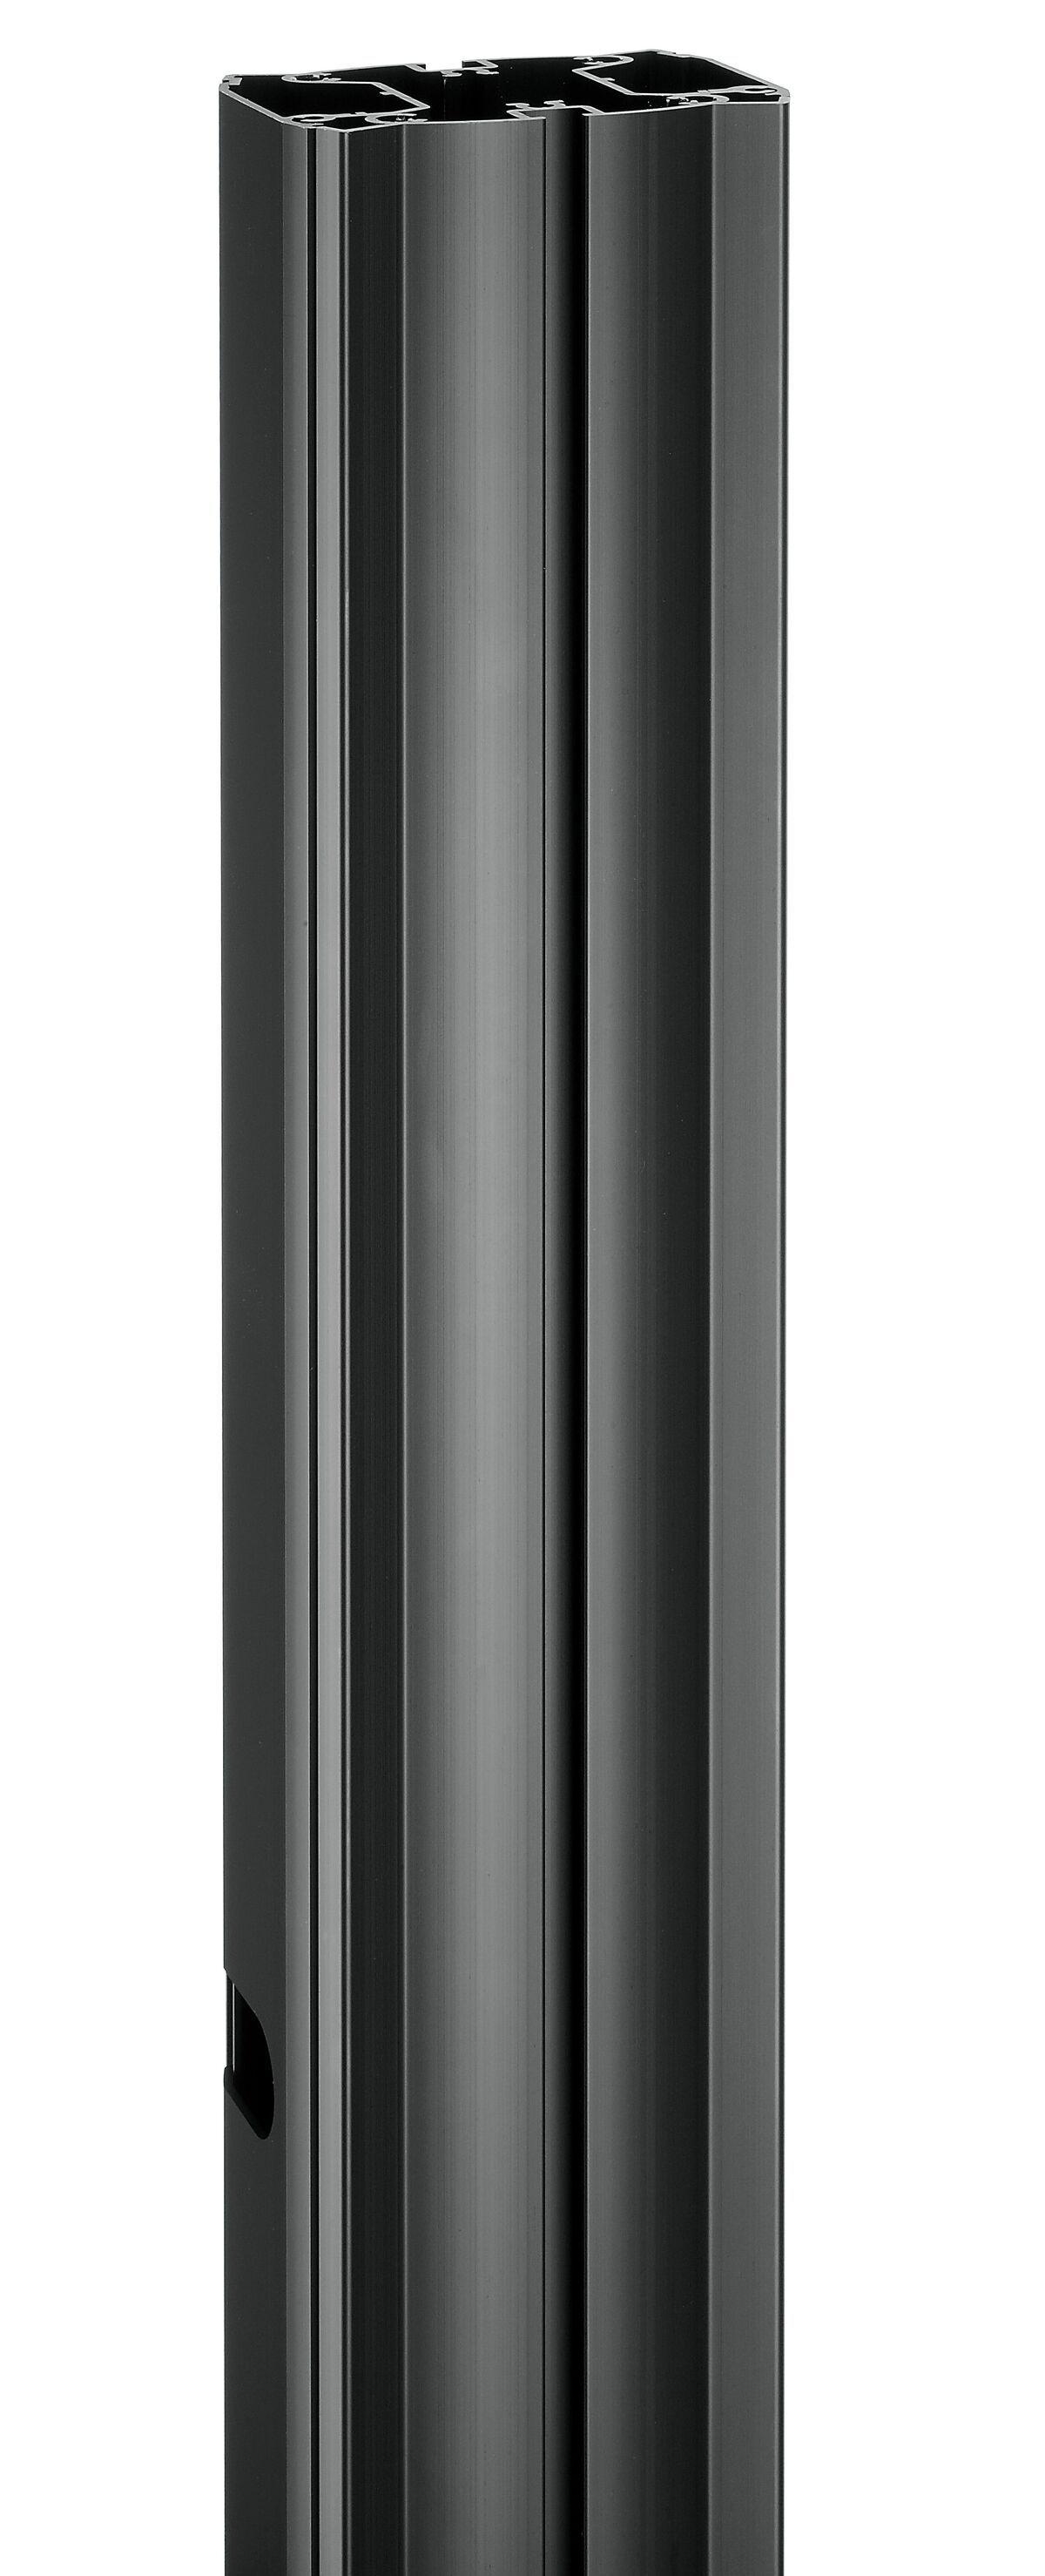 Vogel's PUC 2718 Palo, colore nero - Product